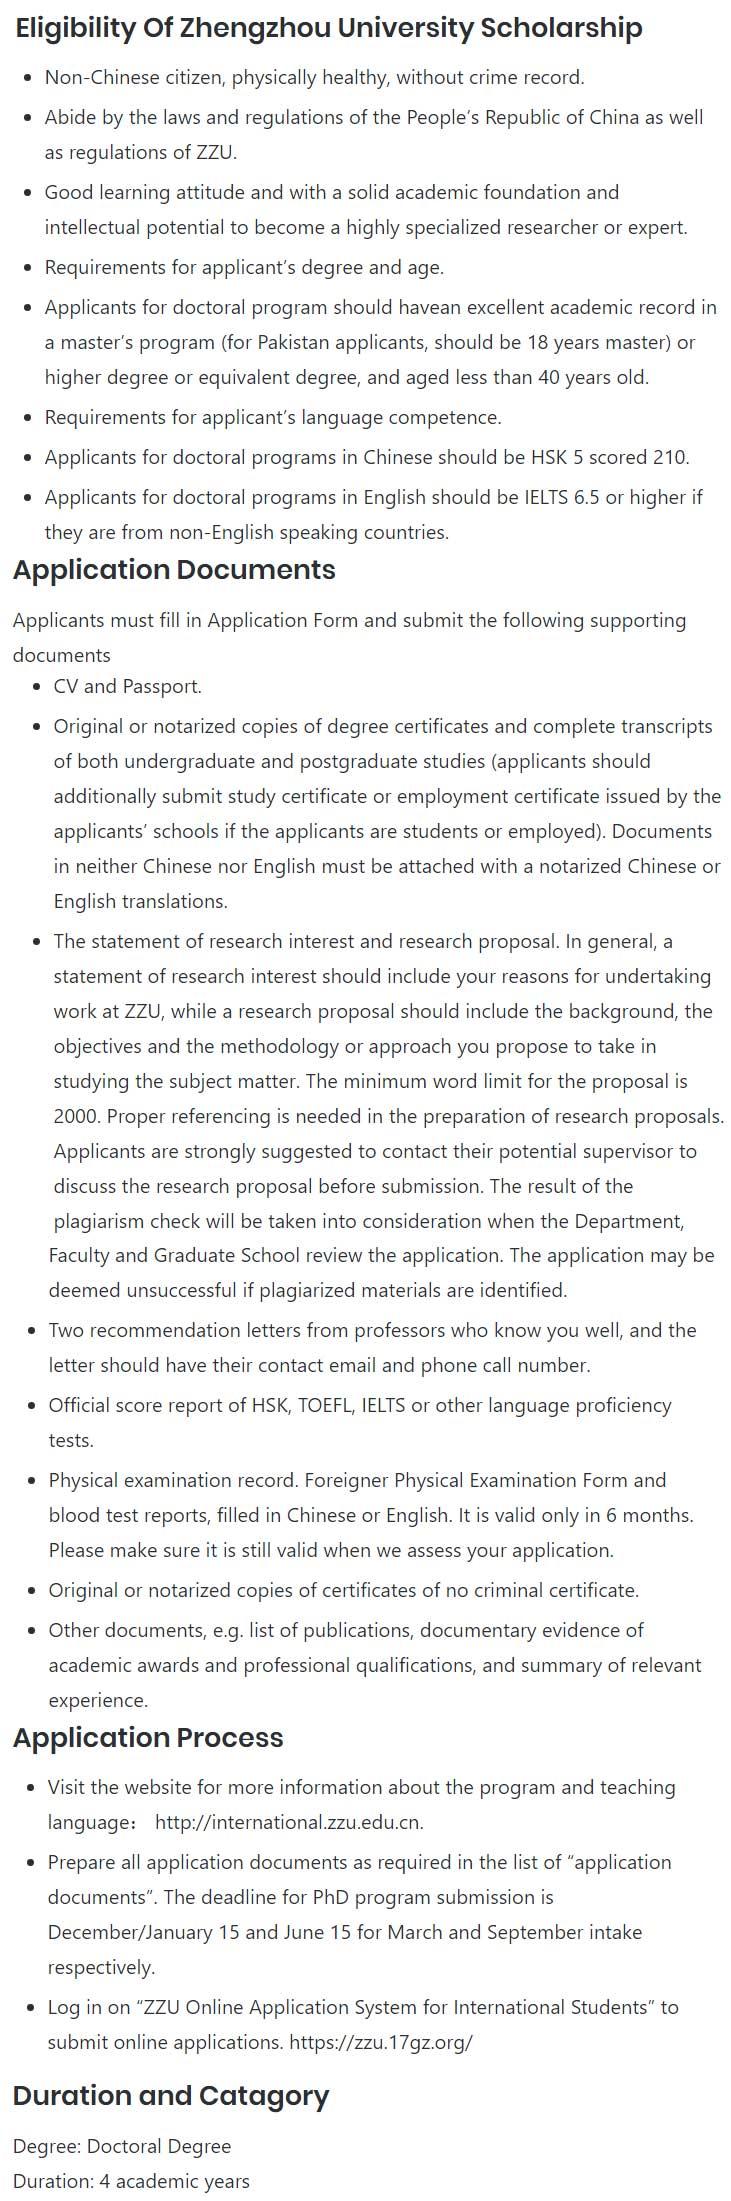 https://ishallwin.com/Content/ScholarshipImages/Zhengzhou-University-President-Scholarship-2020-2021.jpg